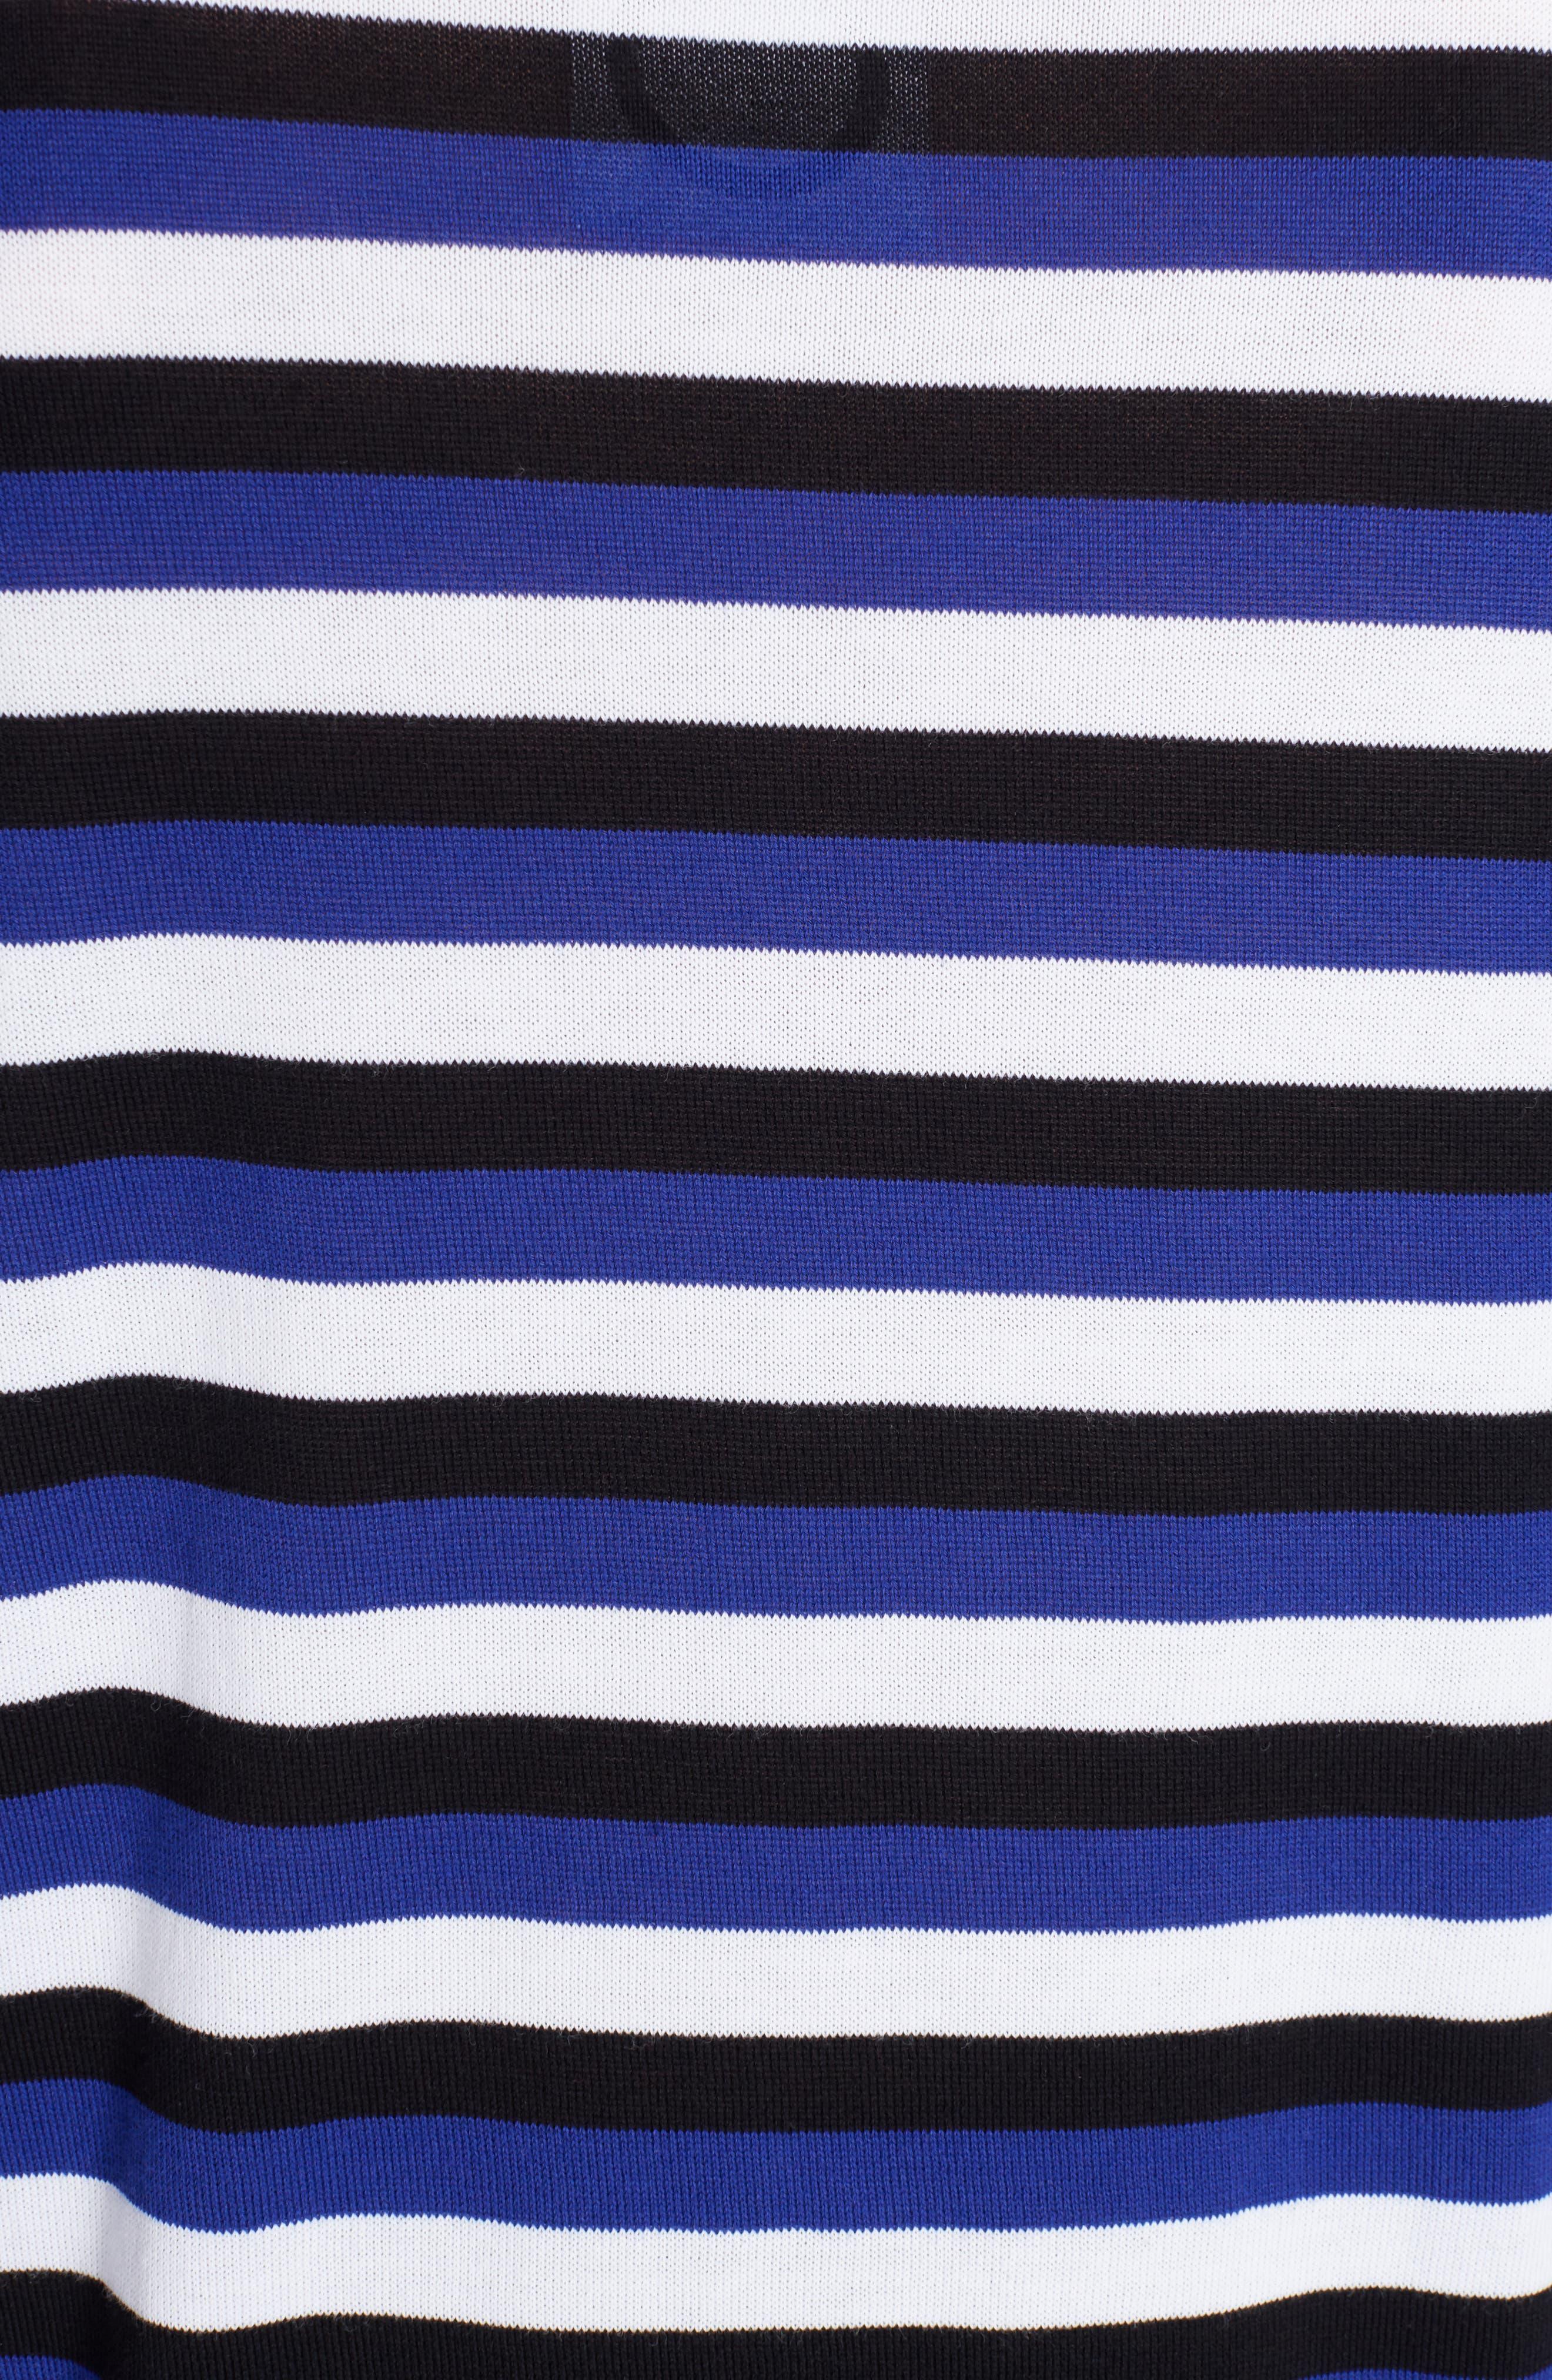 Large K Stripe Sweater,                             Alternate thumbnail 5, color,                             422